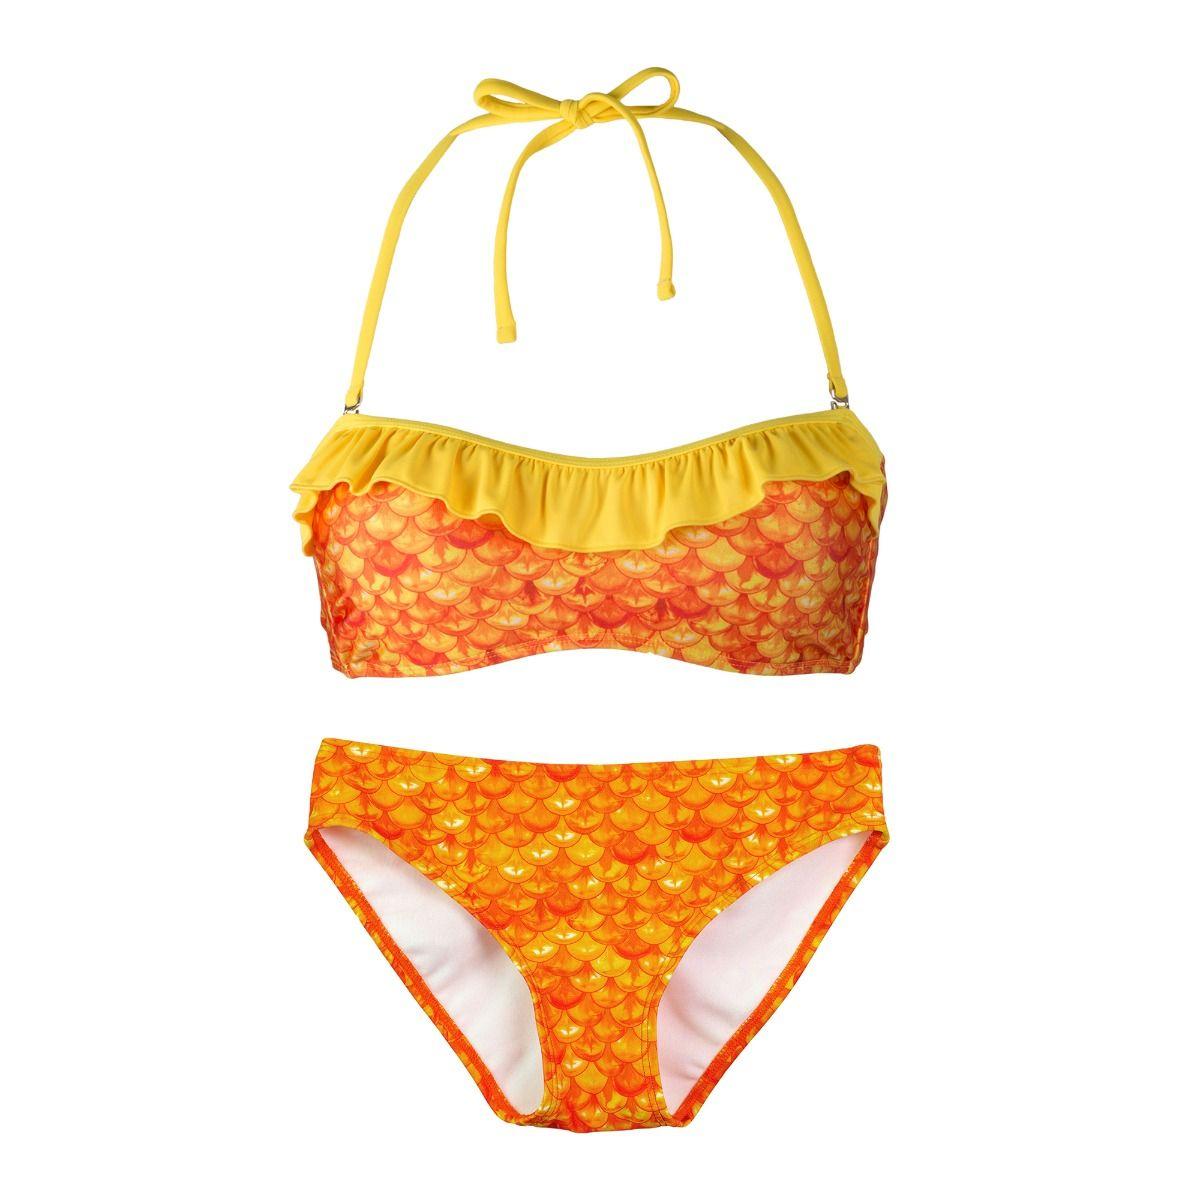 2260879de144e Tropical Sunrise Bandeau Bikini Set. Tap to expand